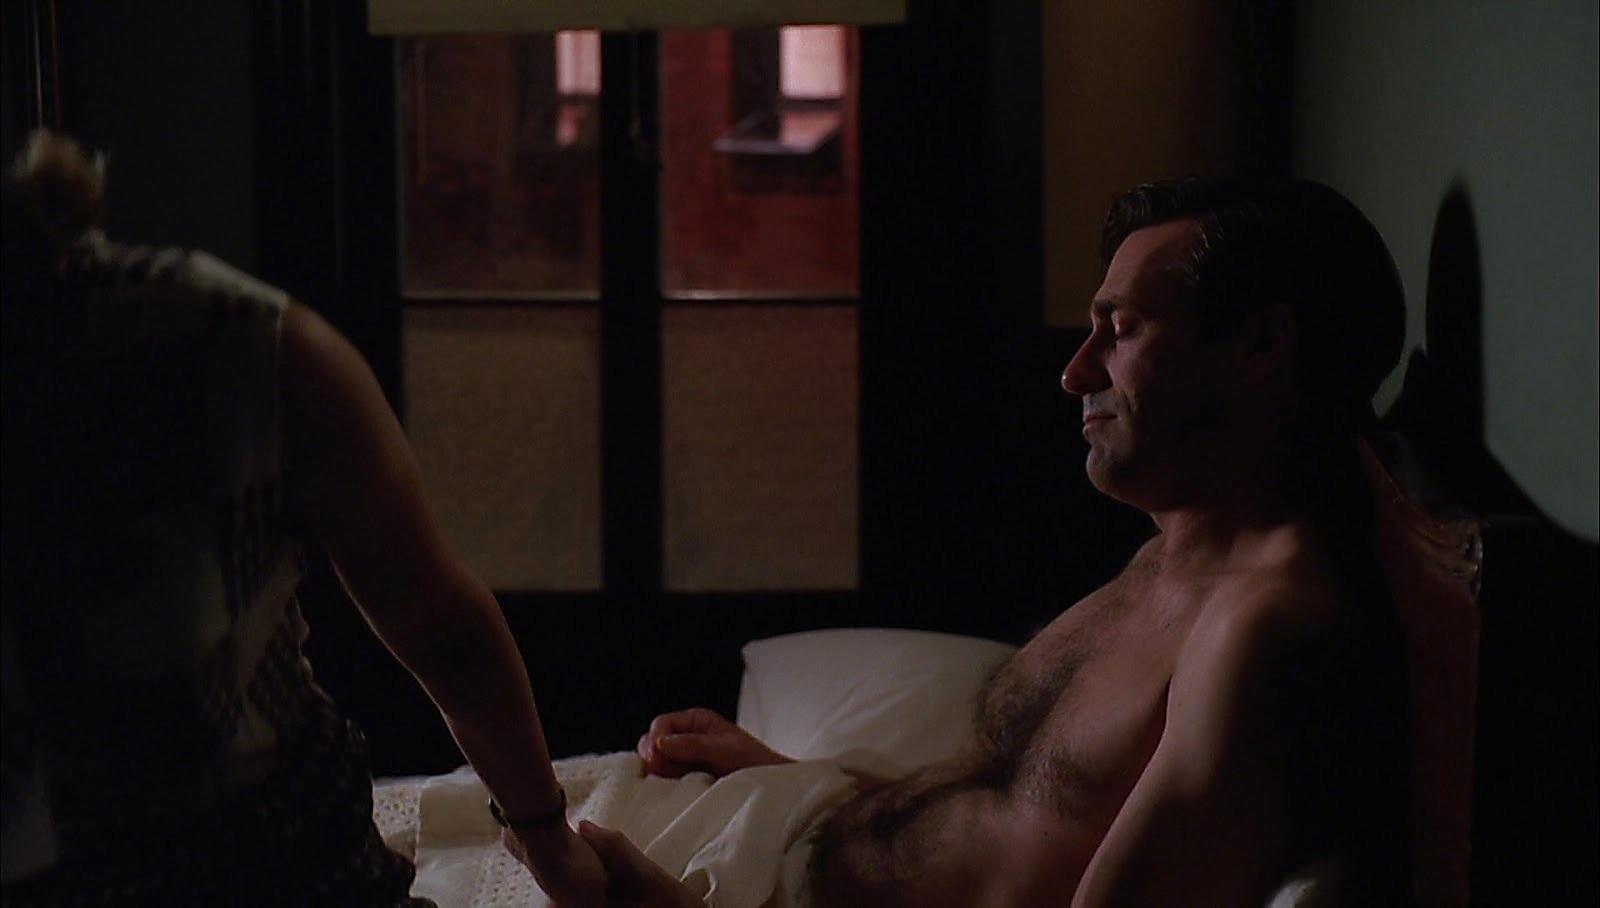 Jon Hamm sexy shirtless scene March 29, 2017, 1pm